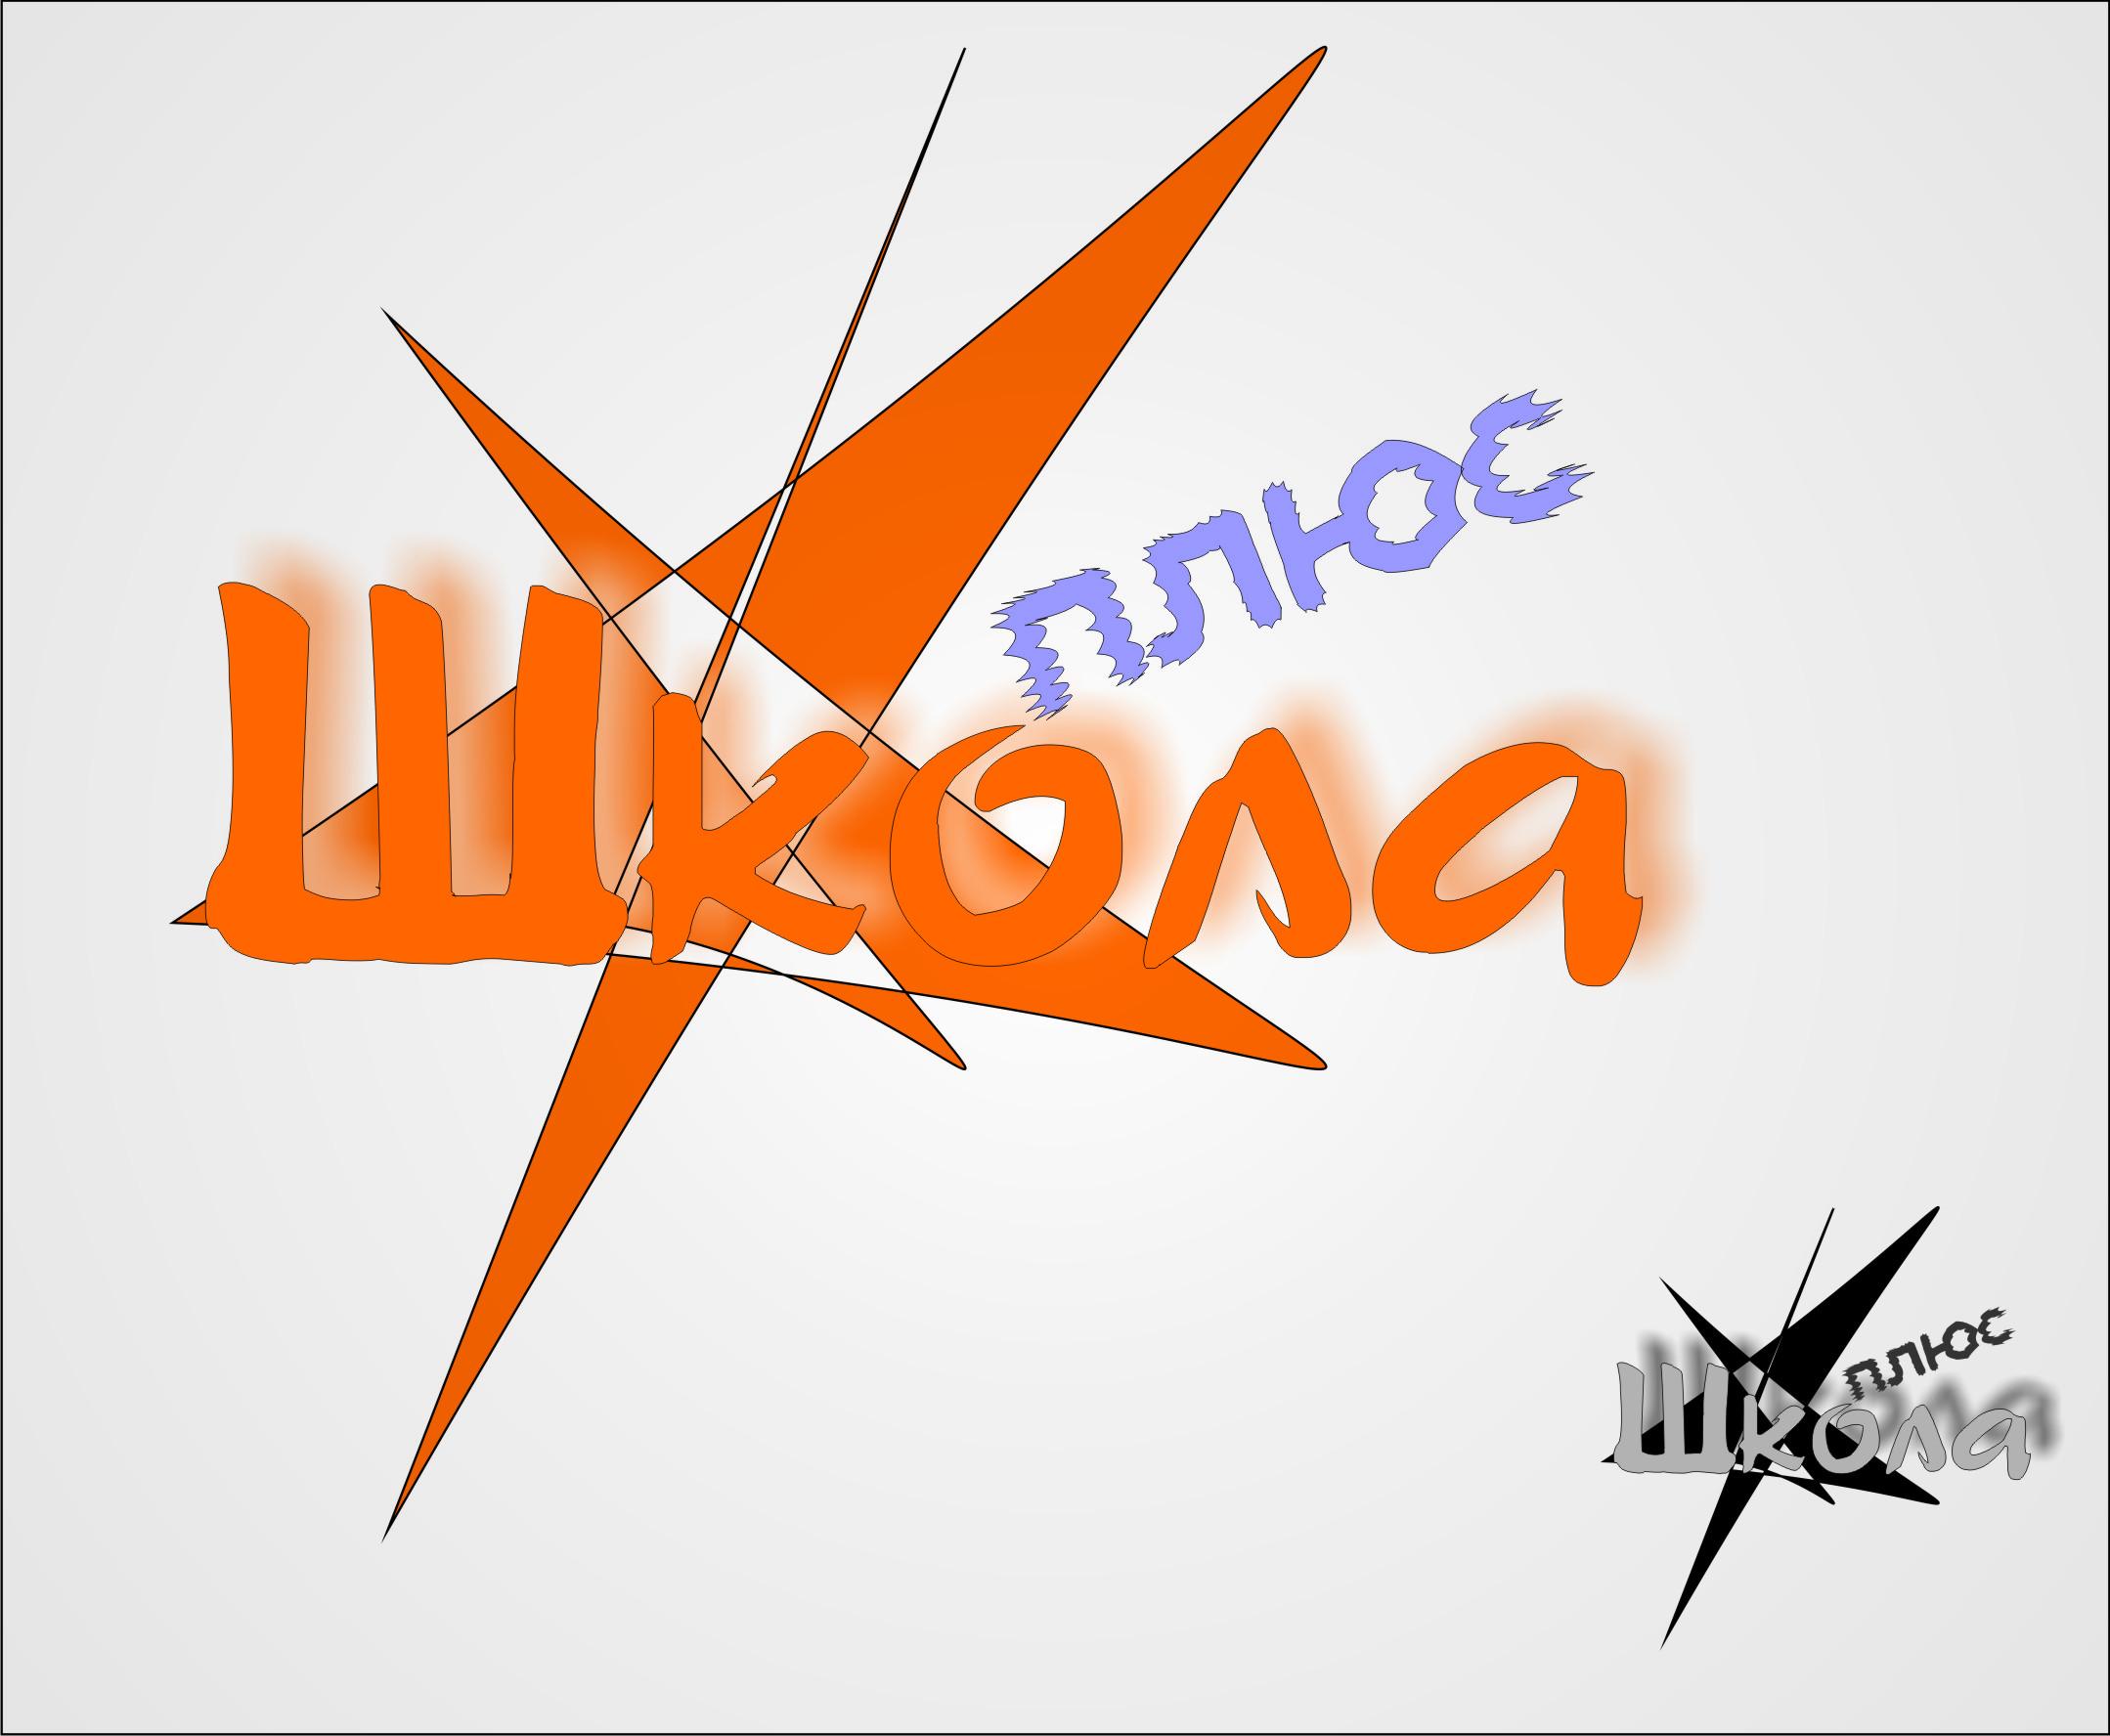 Разработка логотипа и пары элементов фирменного стиля фото f_4dac79a21a5cc.jpg